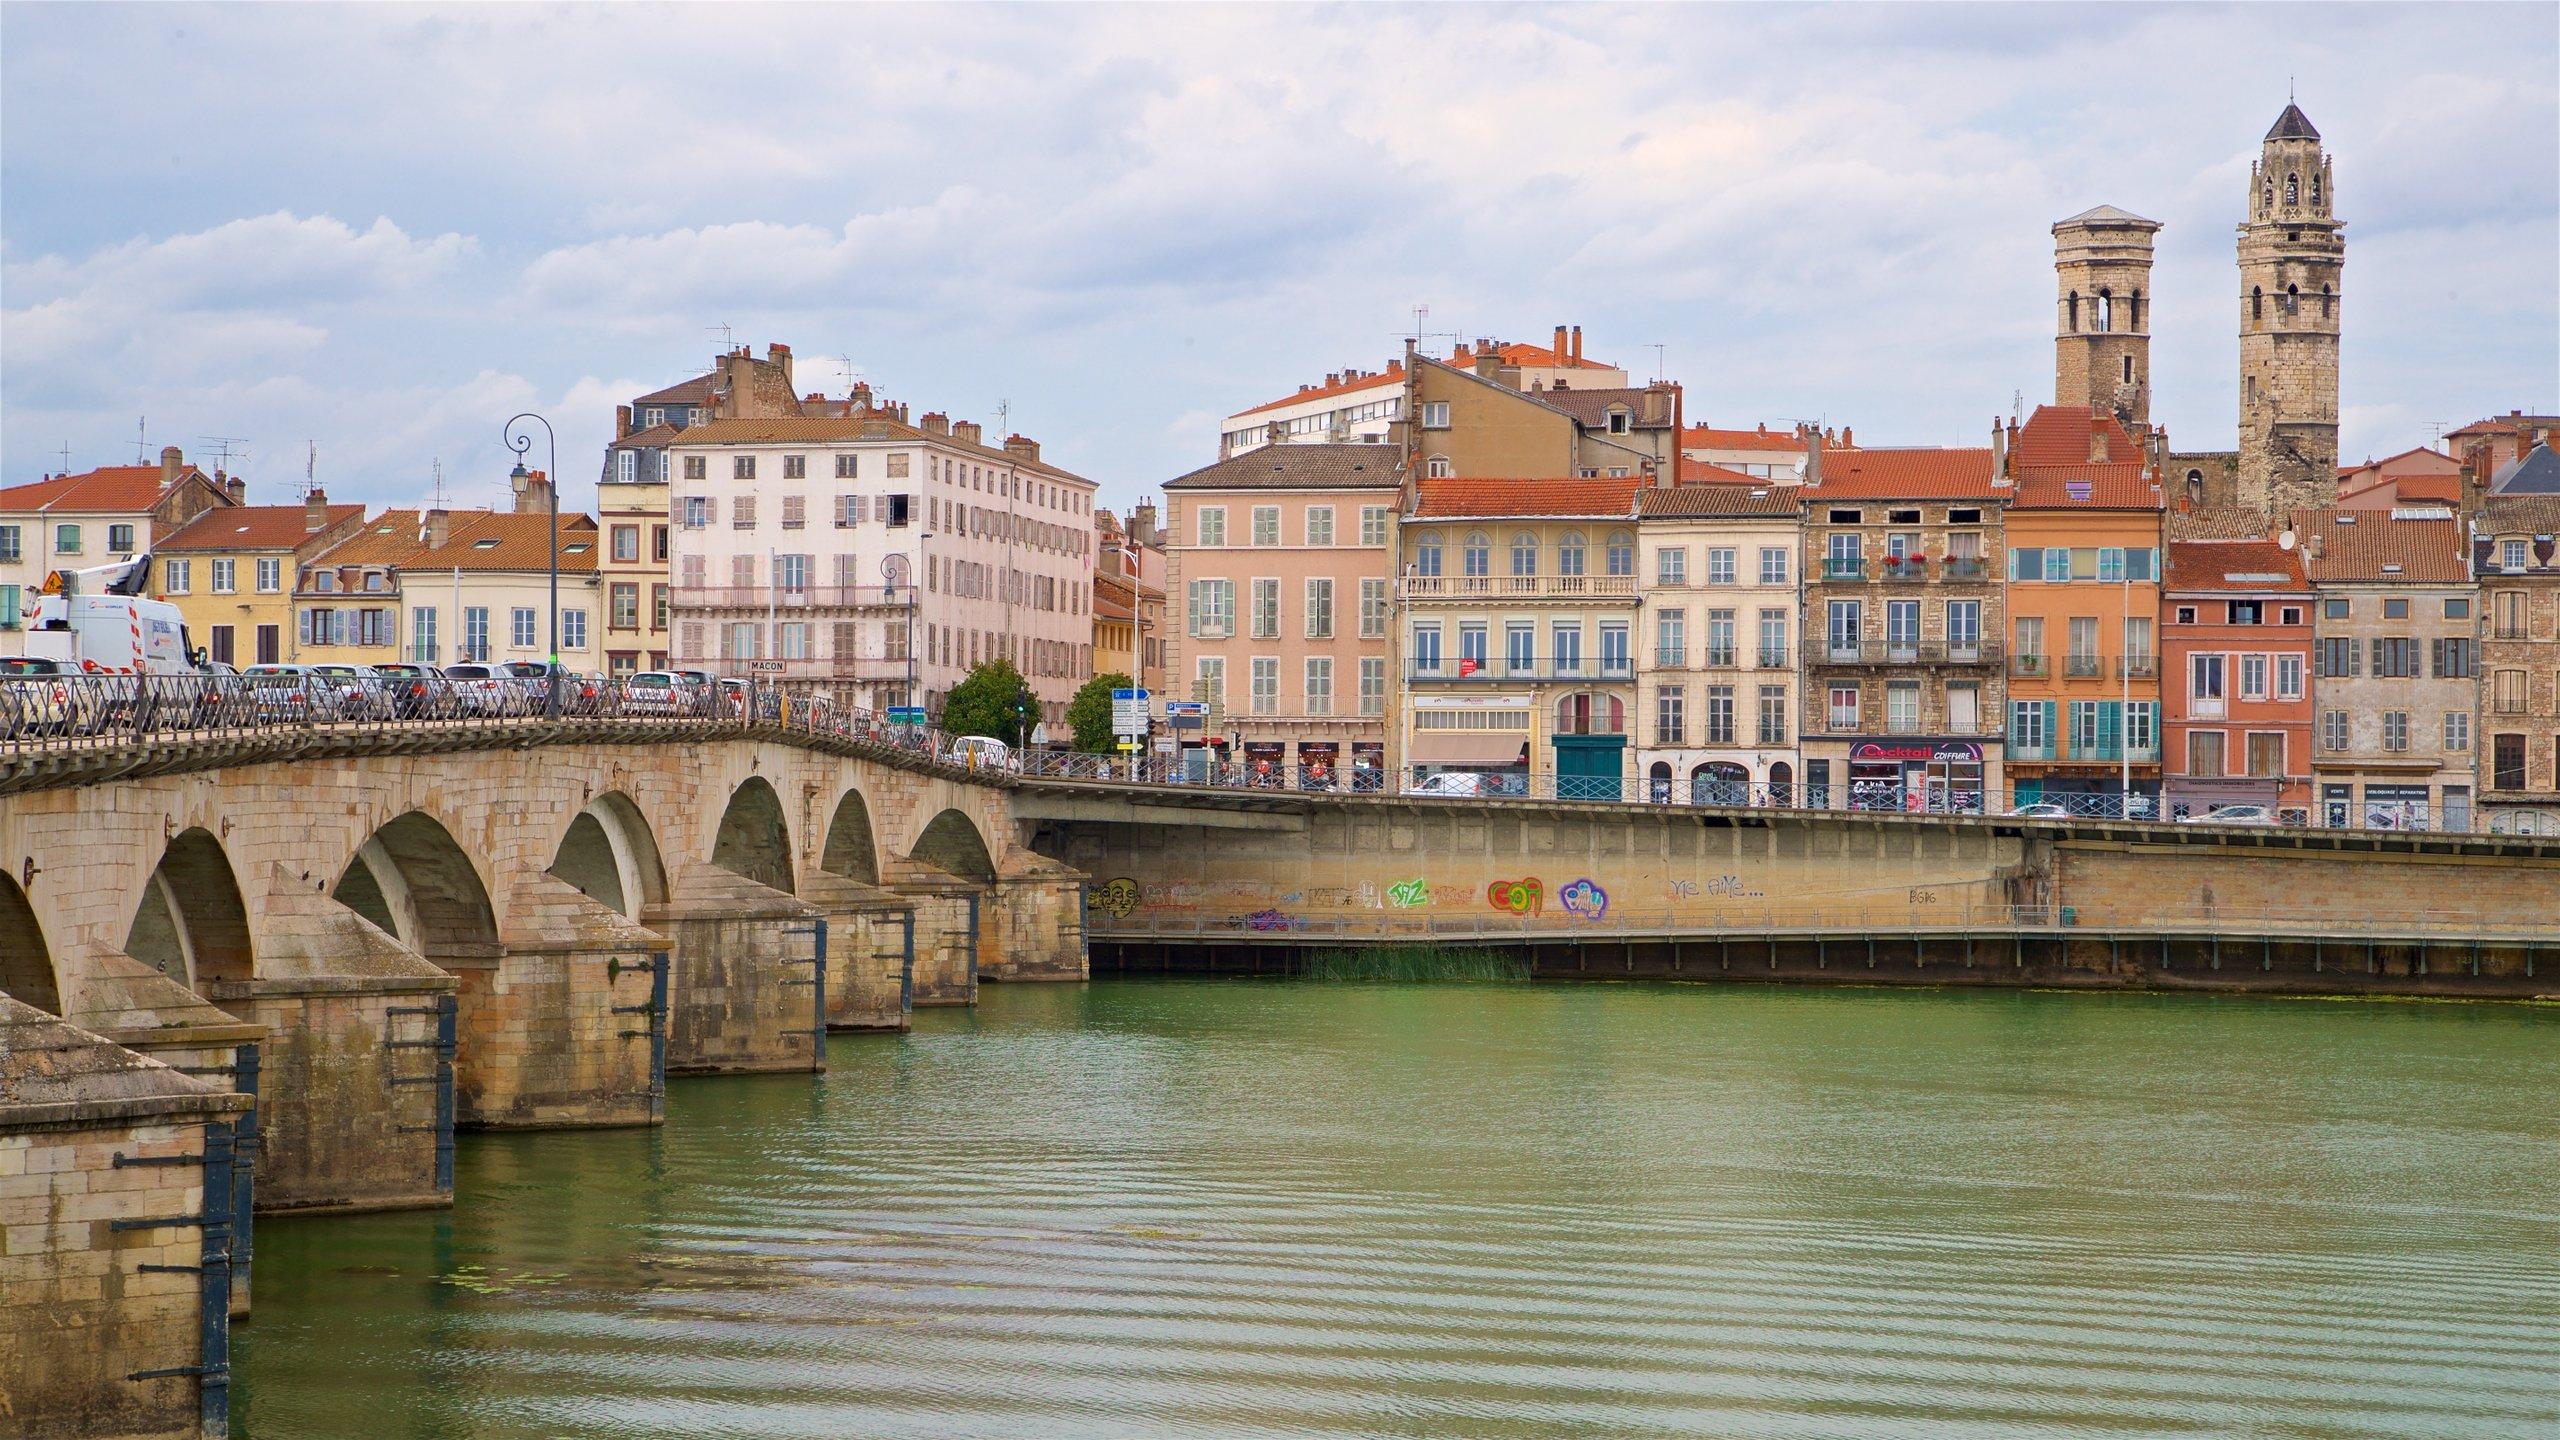 Saône-et-Loire (departement), Frankrijk